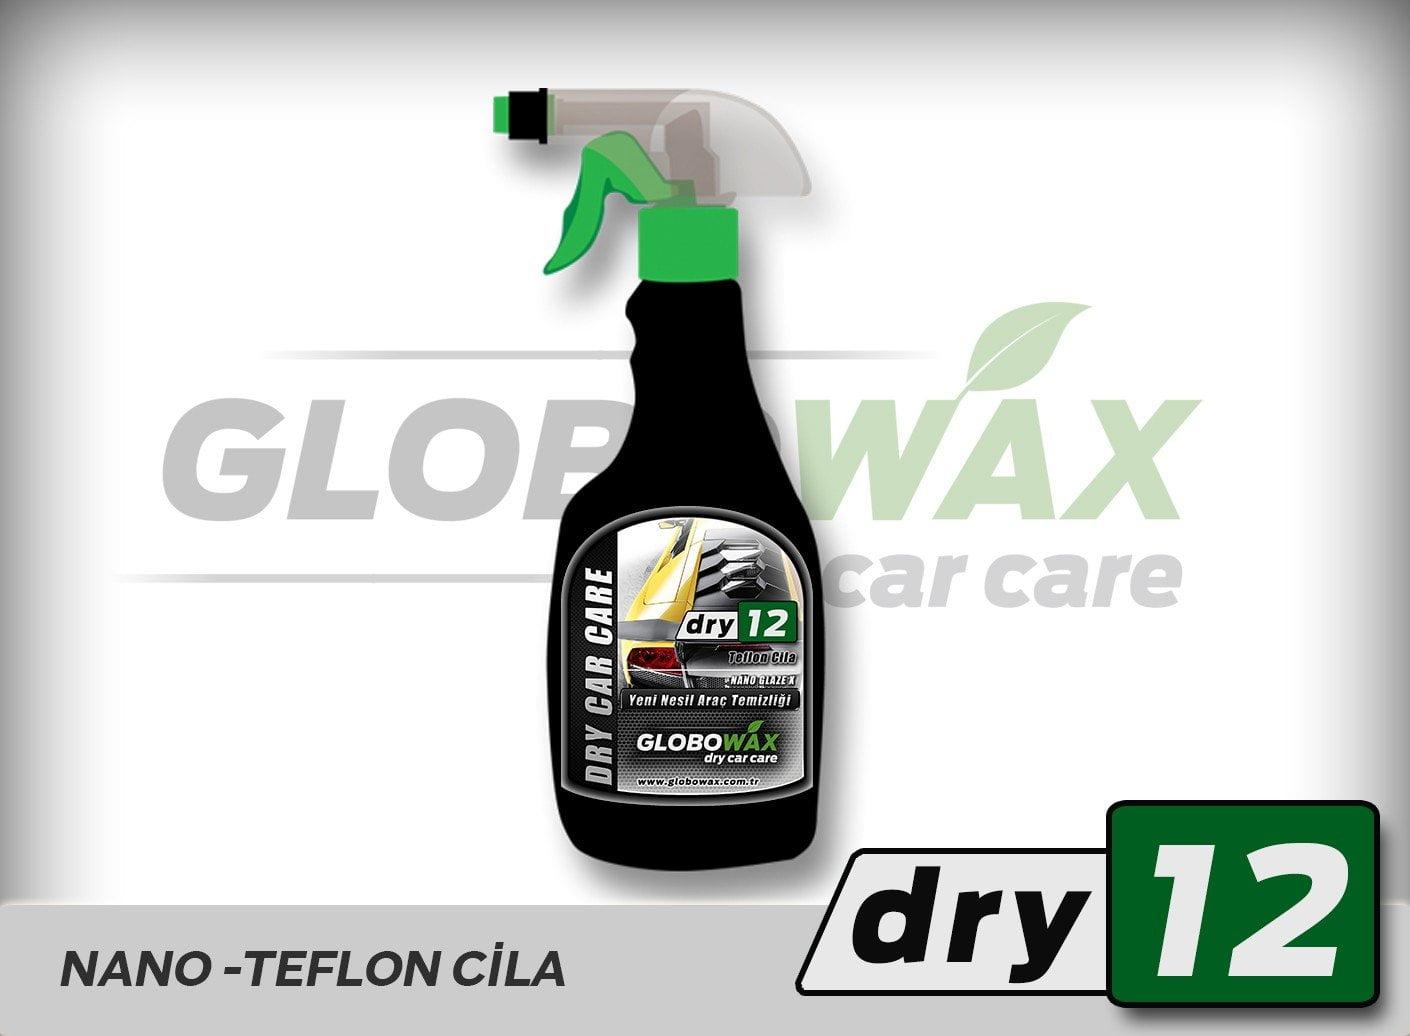 GLOBOWAX-SISE-12-12-12